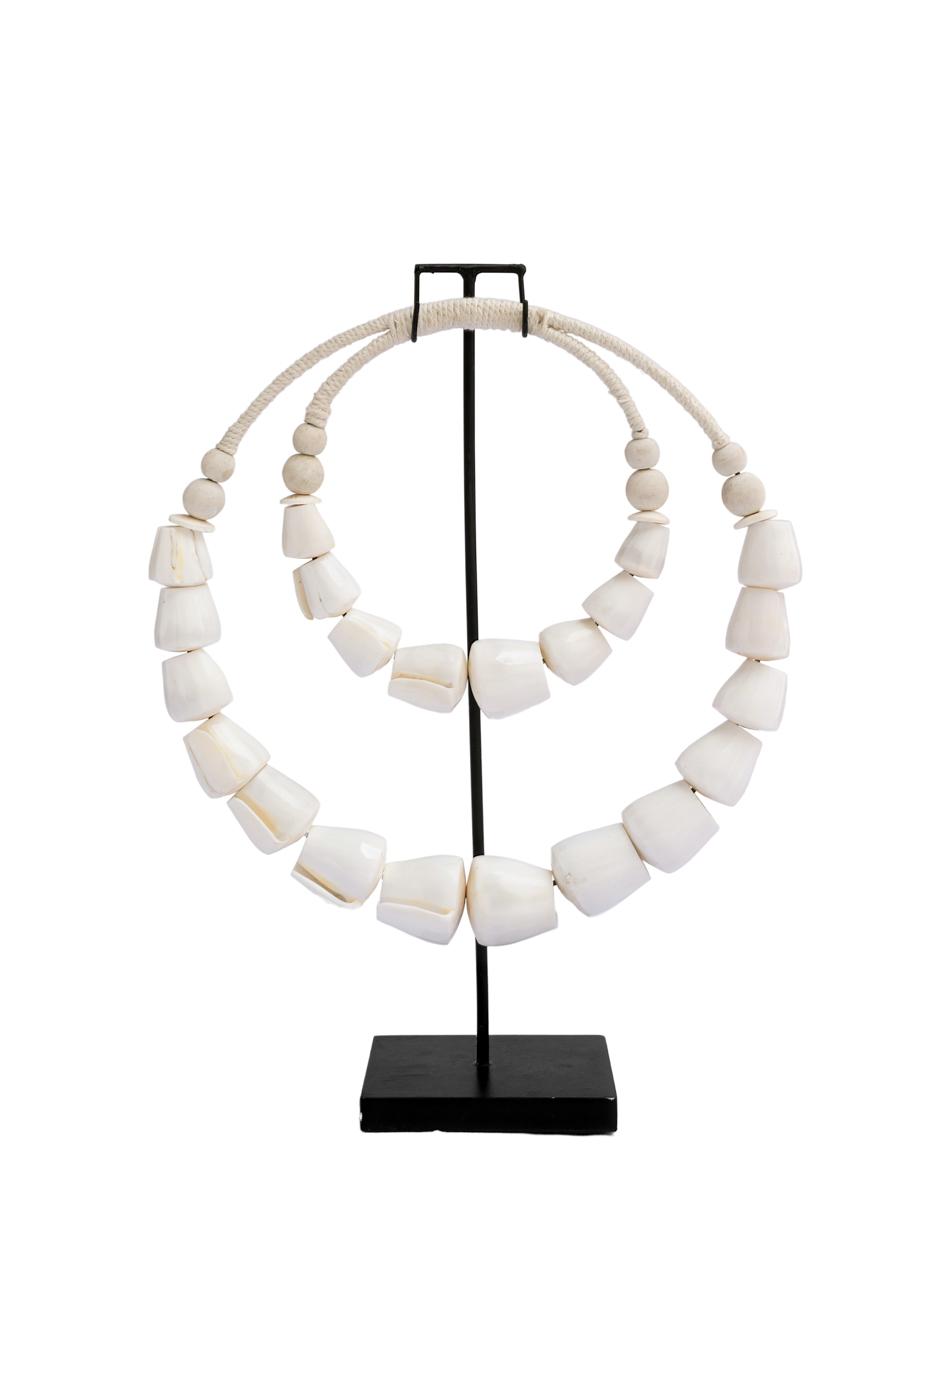 Collar decorativo caracoles naturales con base de metal